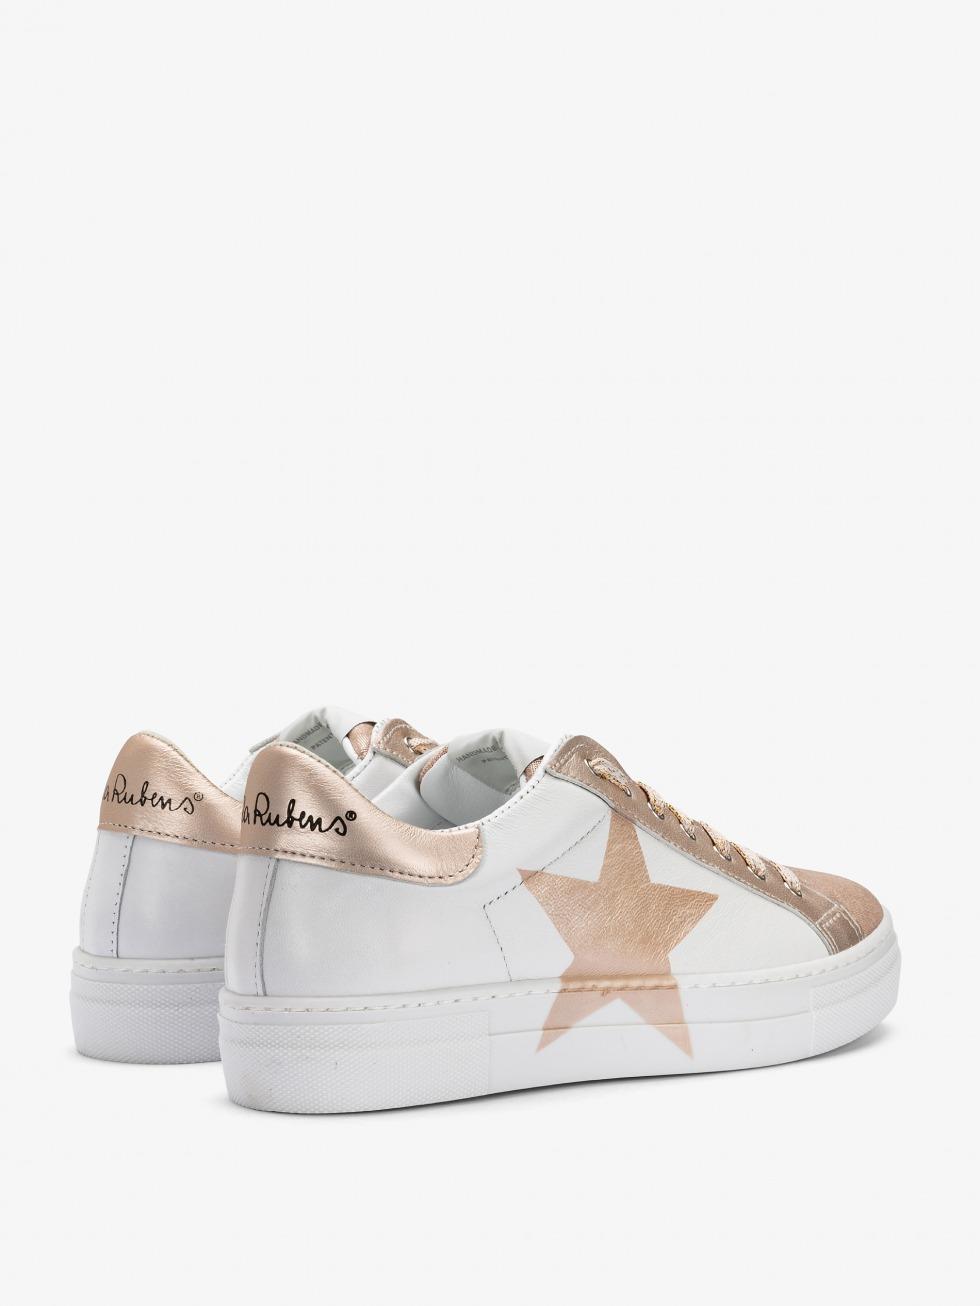 Sneakers Martini Luxury Avorio - Stella